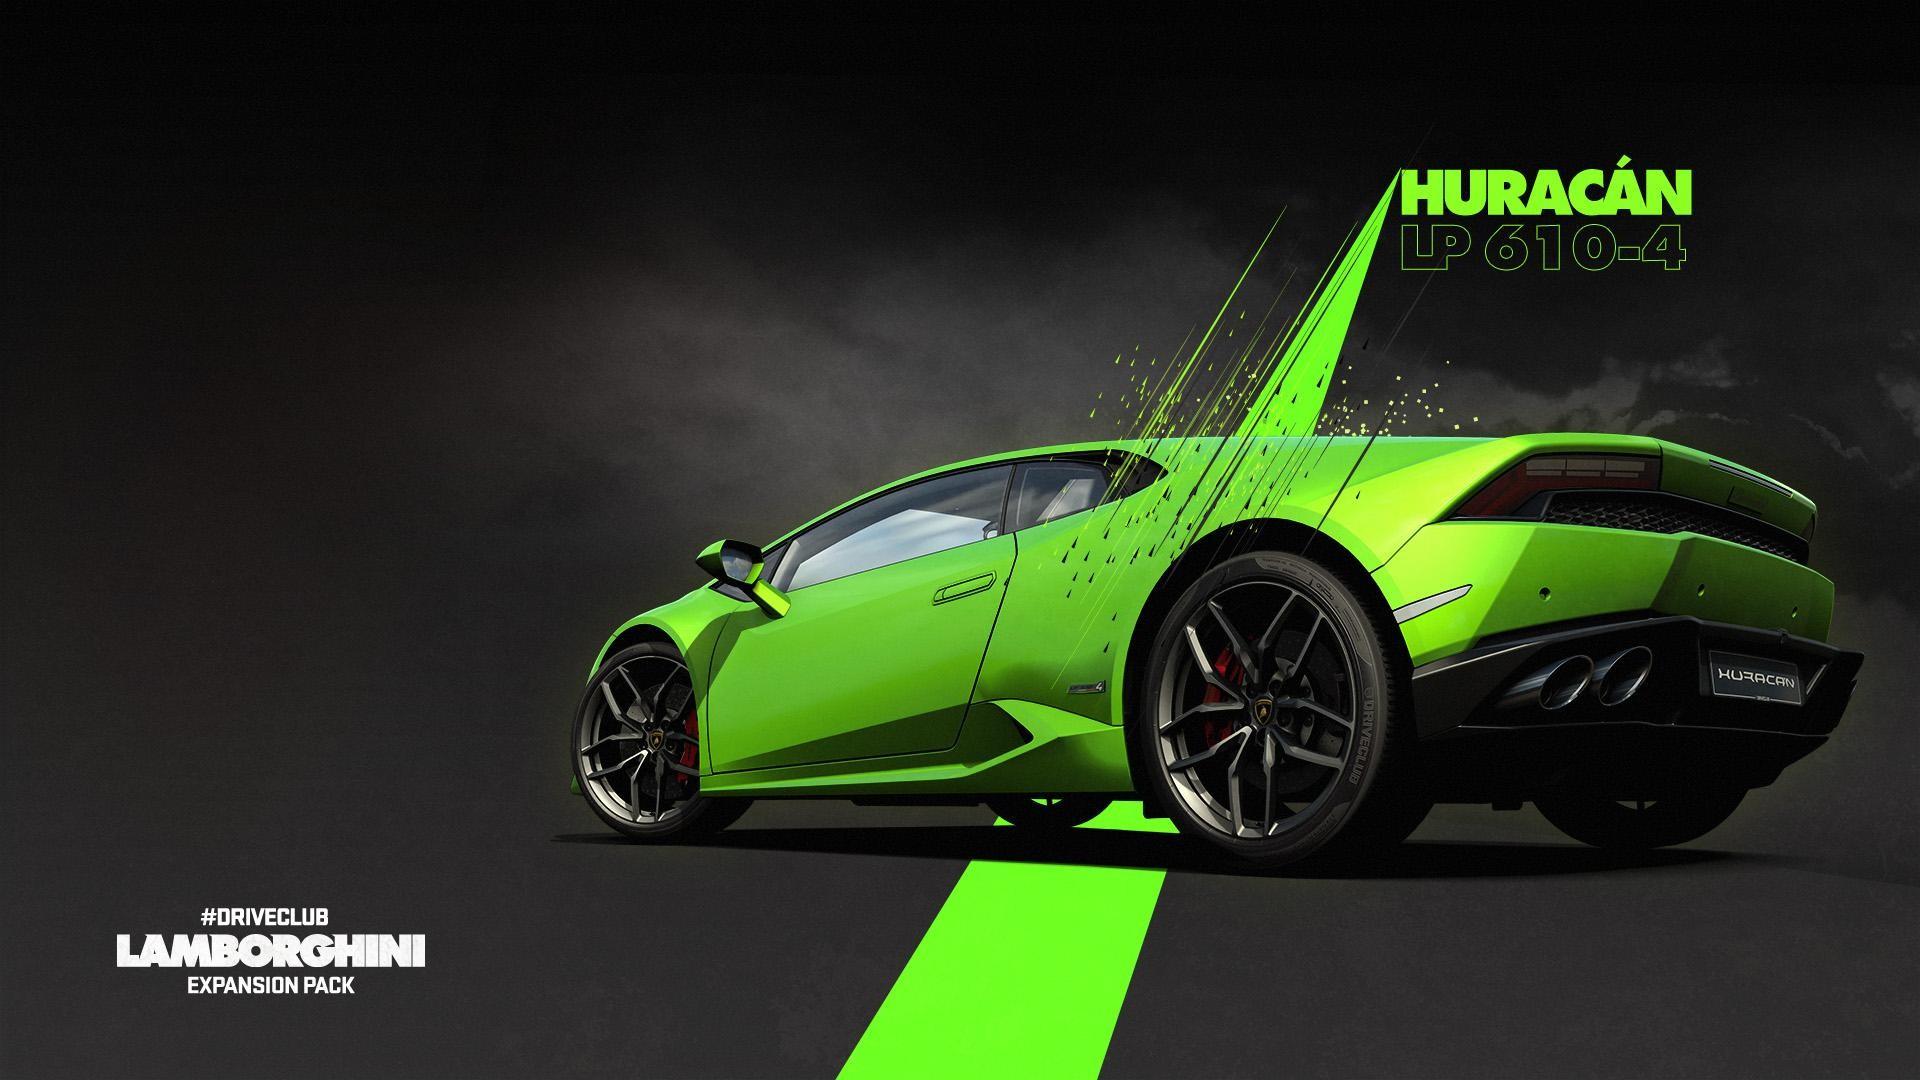 1920x1080 Px Driveclub Lamborghini Huracan LP 610 4